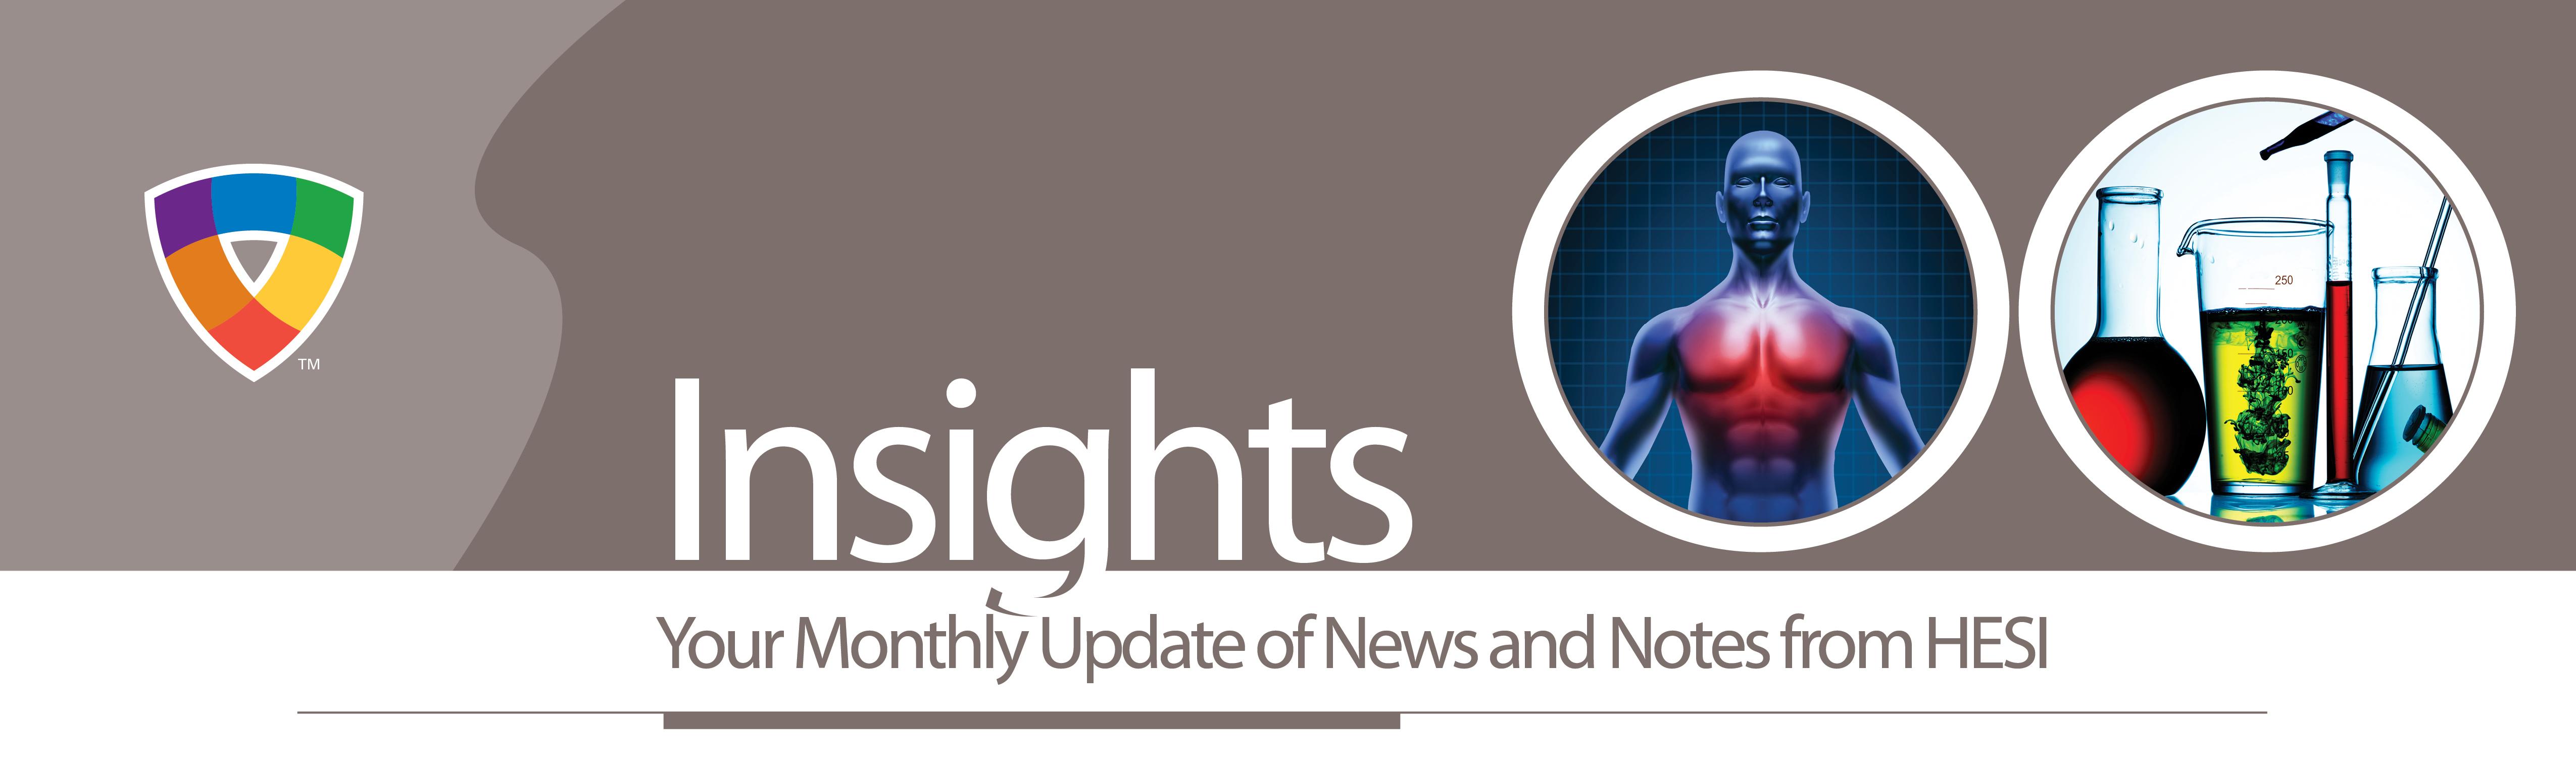 HESI_Insights